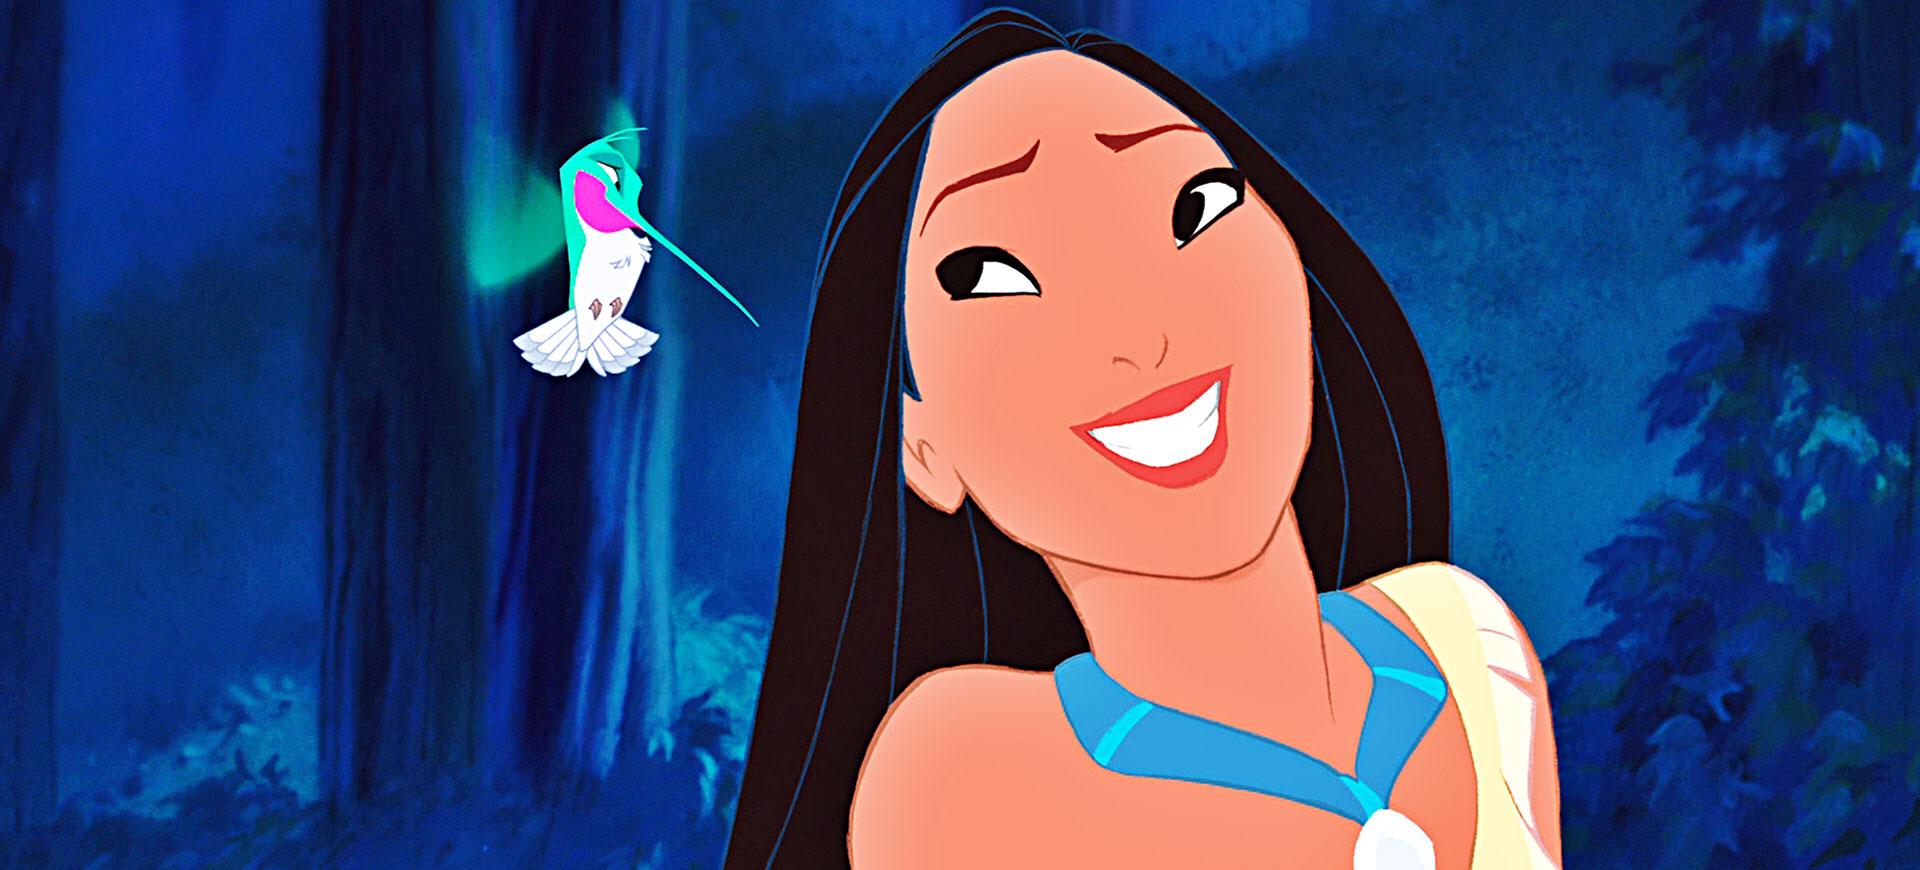 Disney-filmer